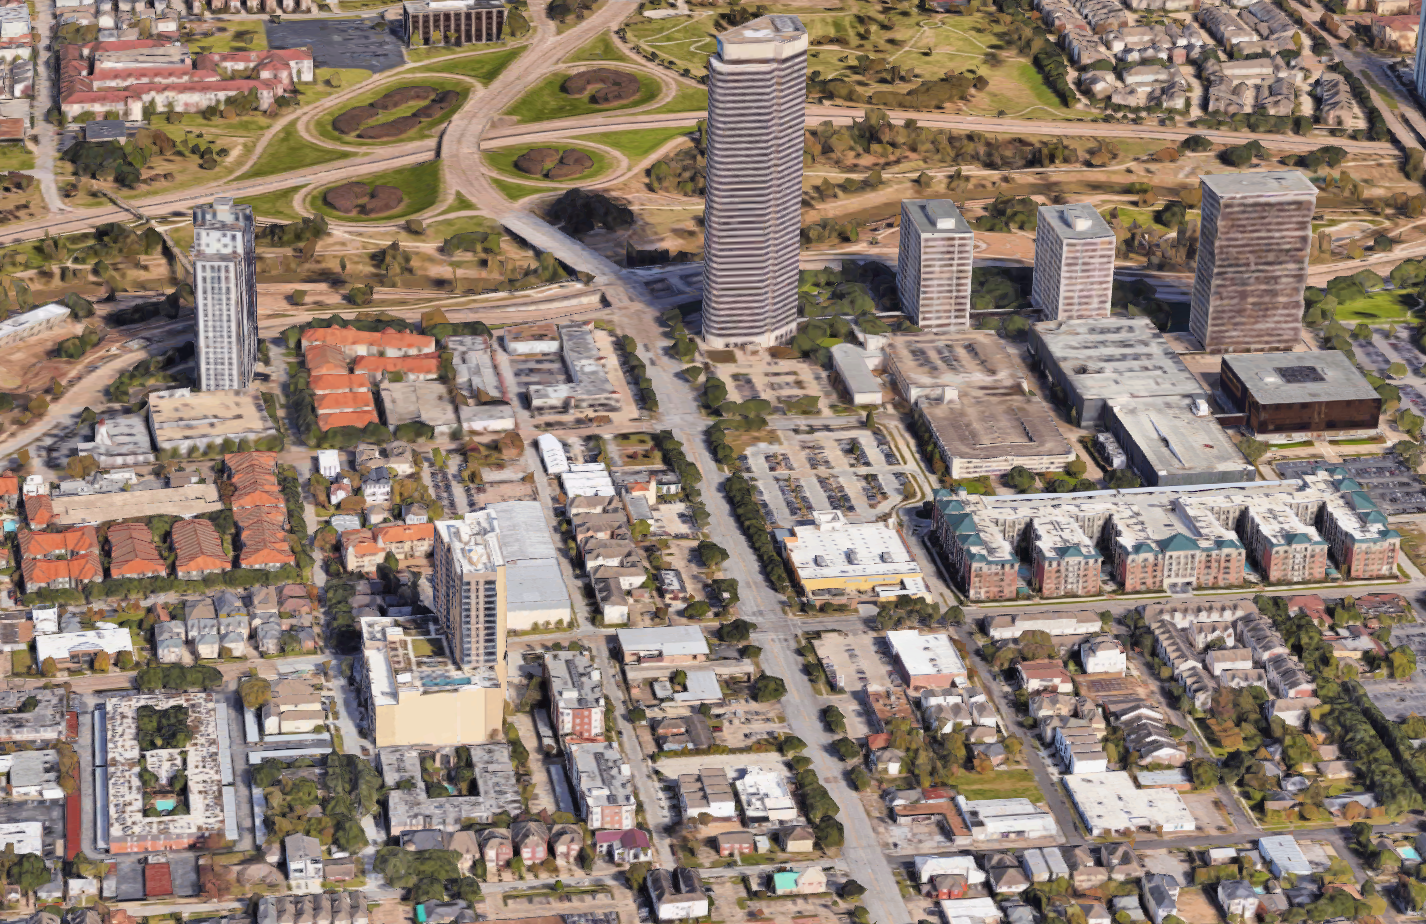 A dense, diverse neighborhood in Houston